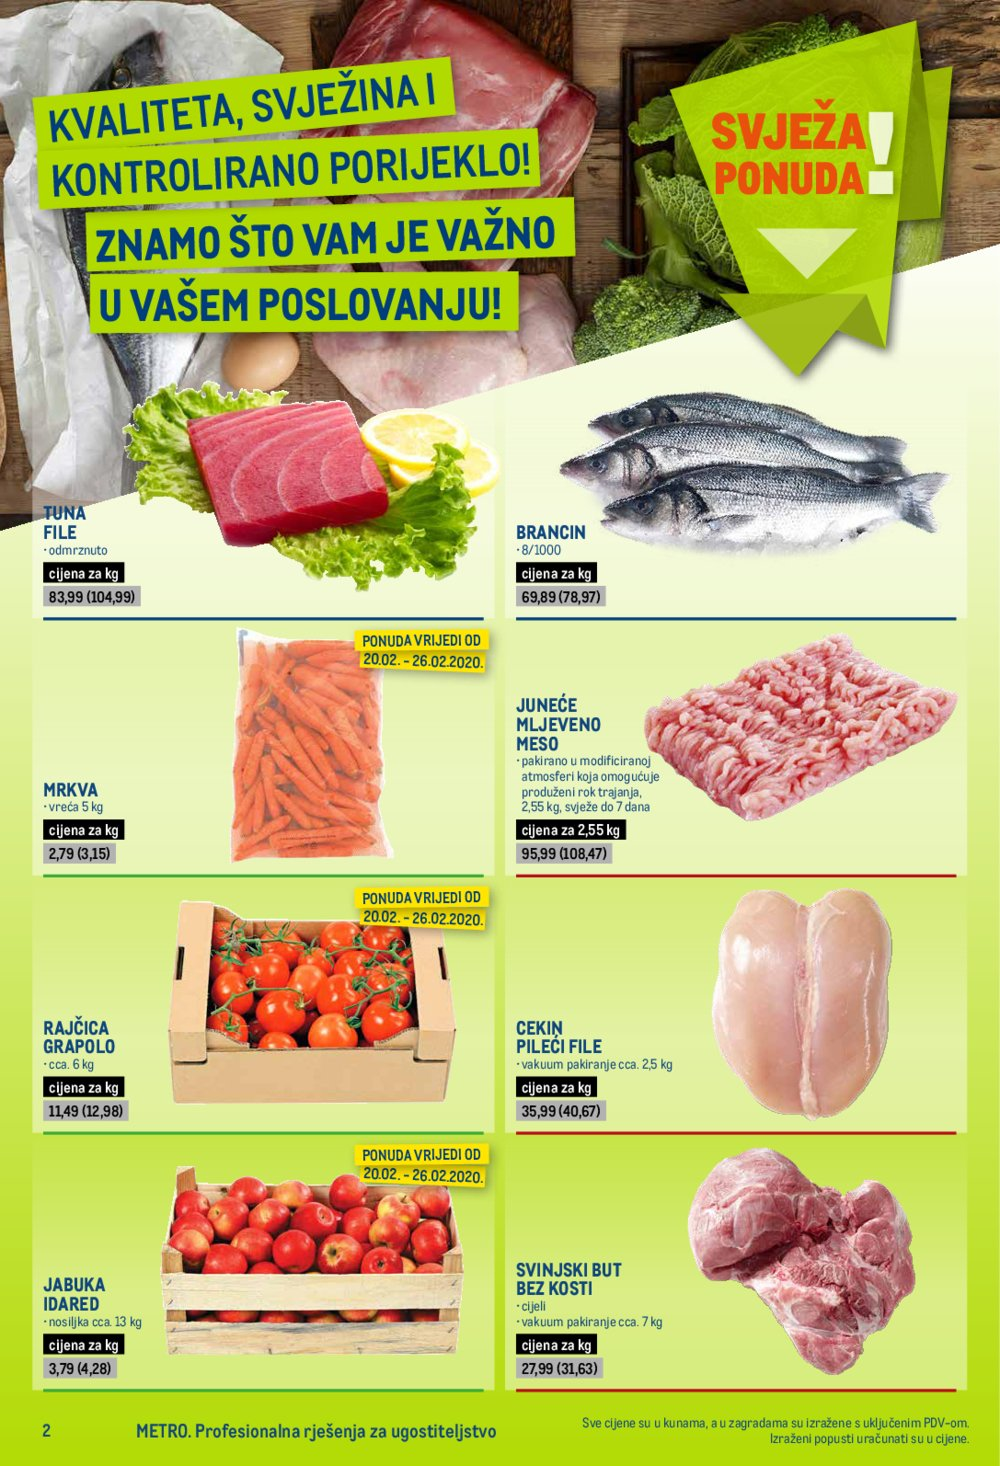 Metro katalog Posebna ponuda za ugostitelje 20.02.-04.03.2020.